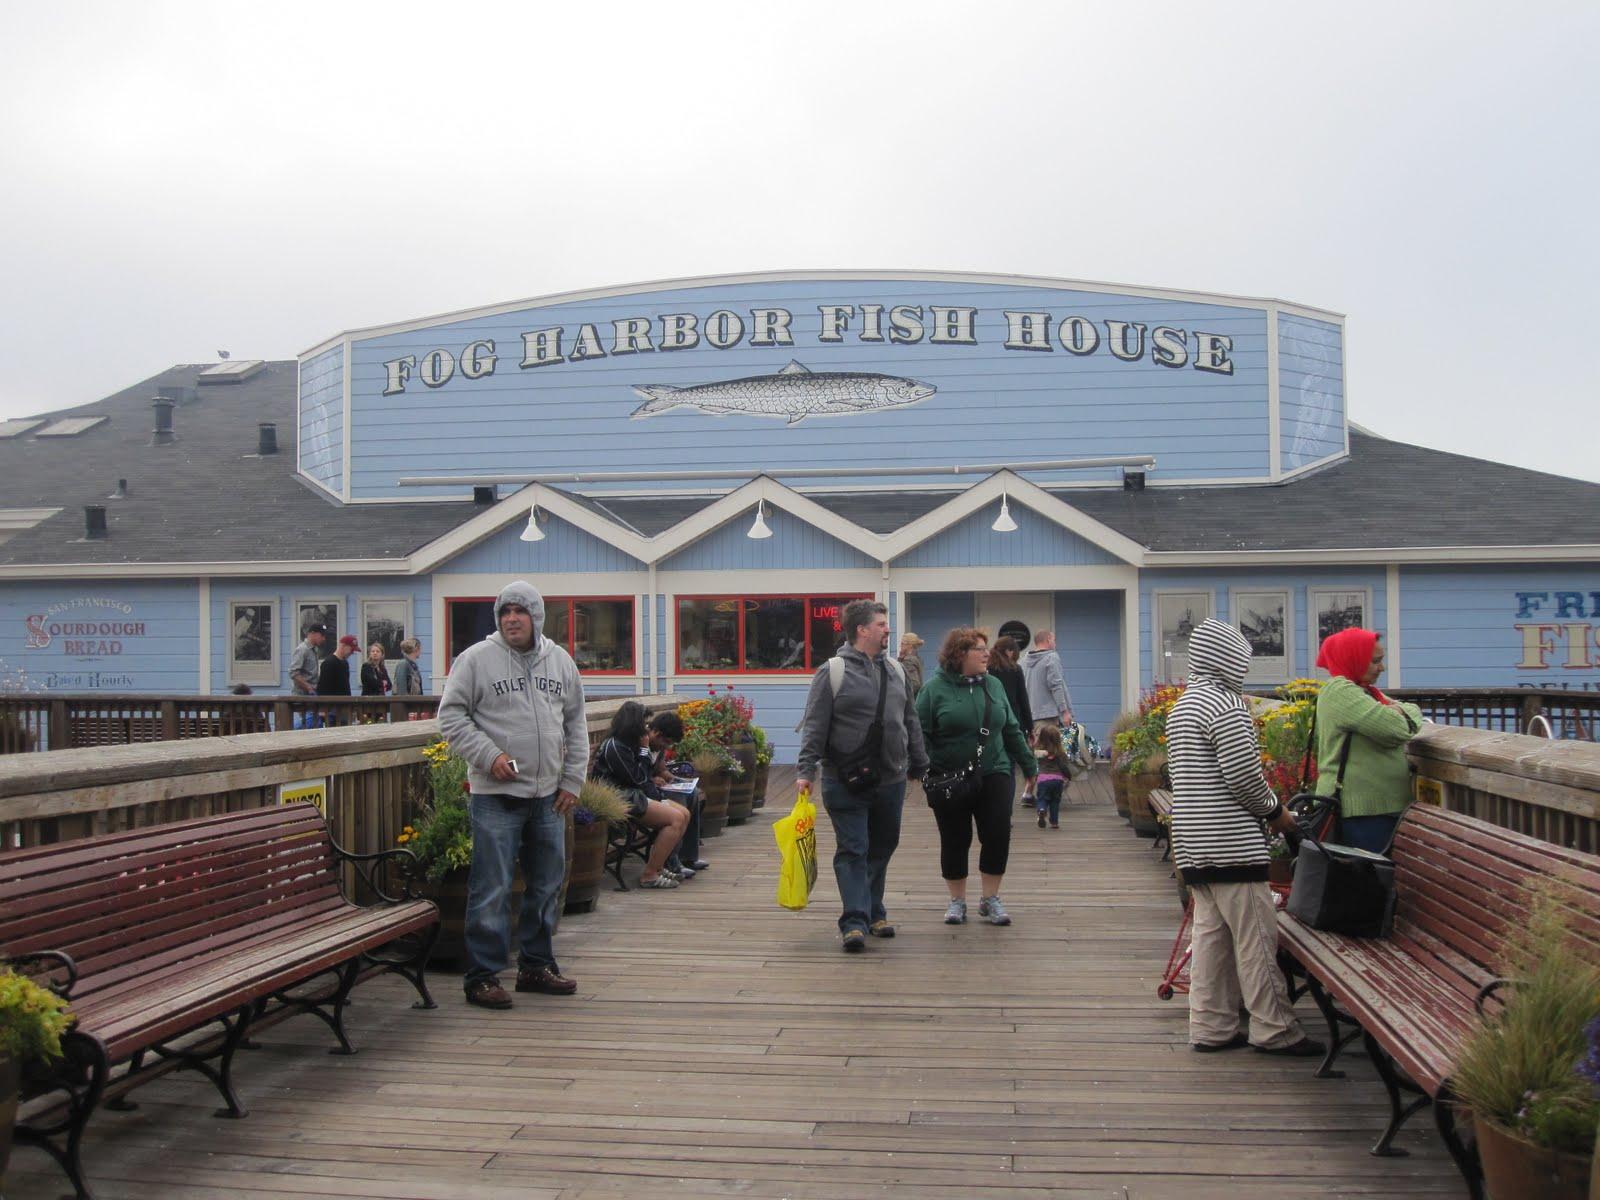 Eating and loving in san francisco fog harbor fish house for Fog harbor fish house san francisco